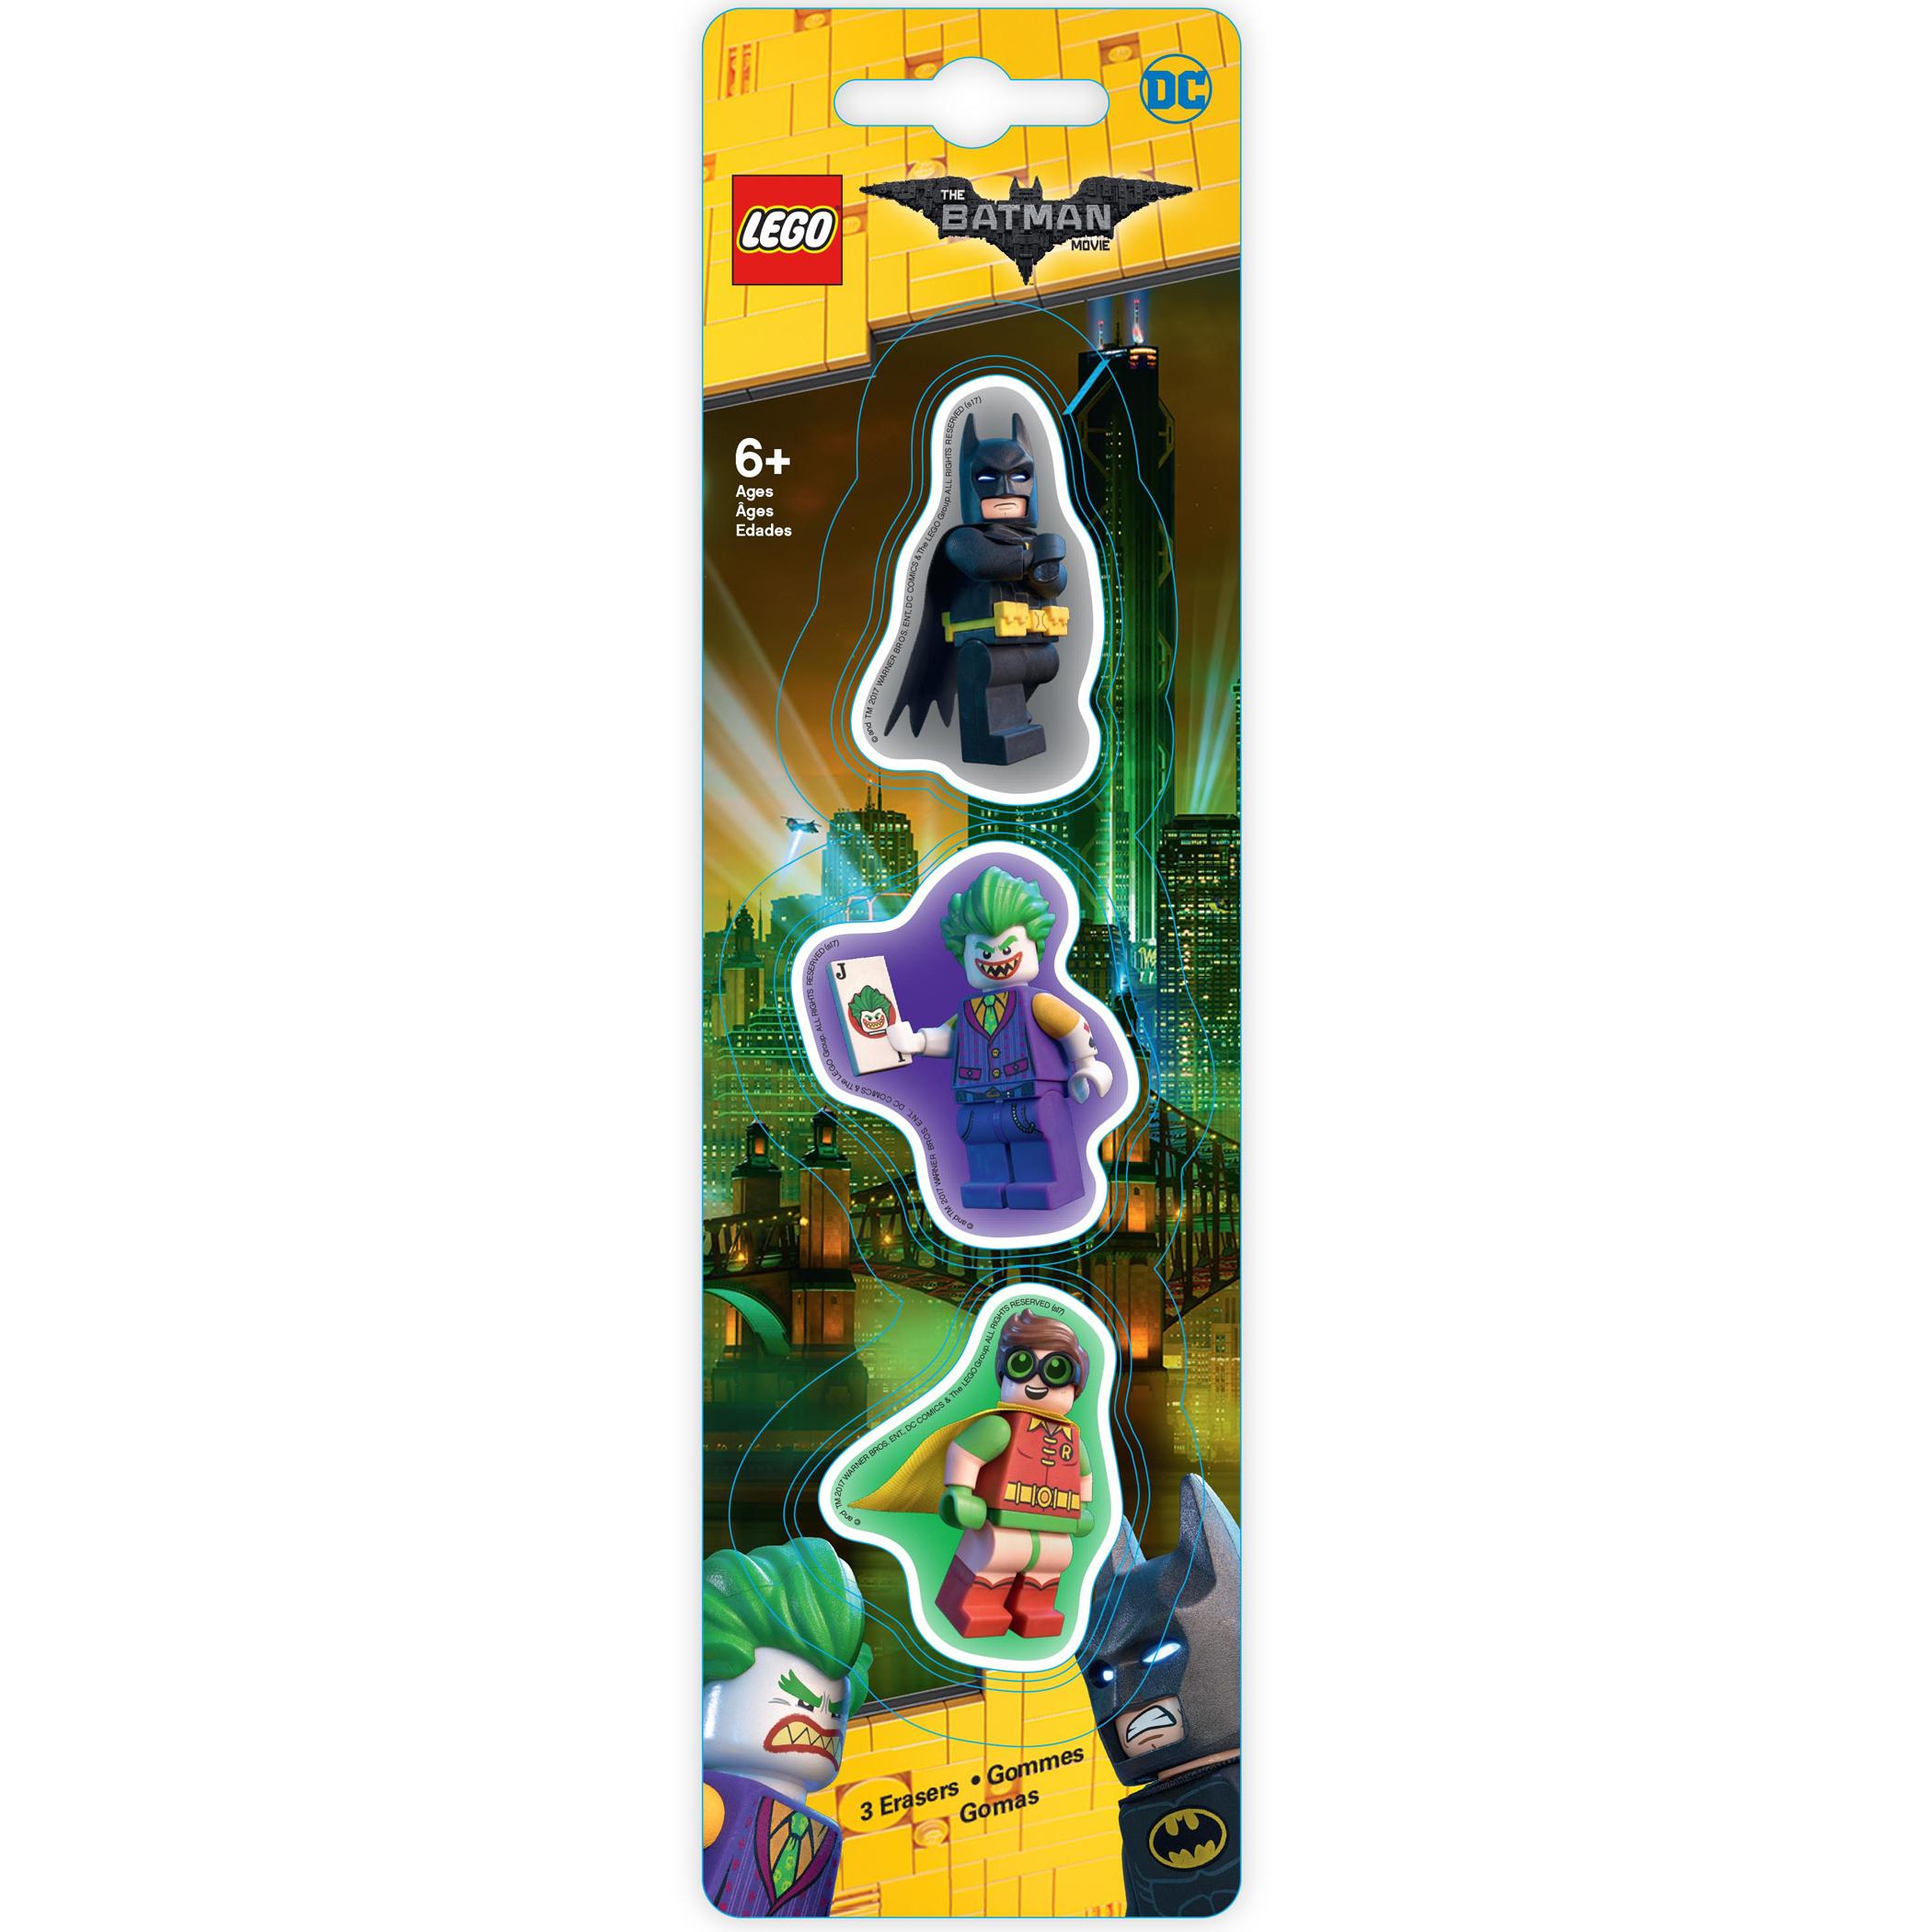 Набор ластиков (3 шт.) LEGO Batman Movie (Лего Фильм: Бэтмен)- Batman/Robin/The Joker (51760)